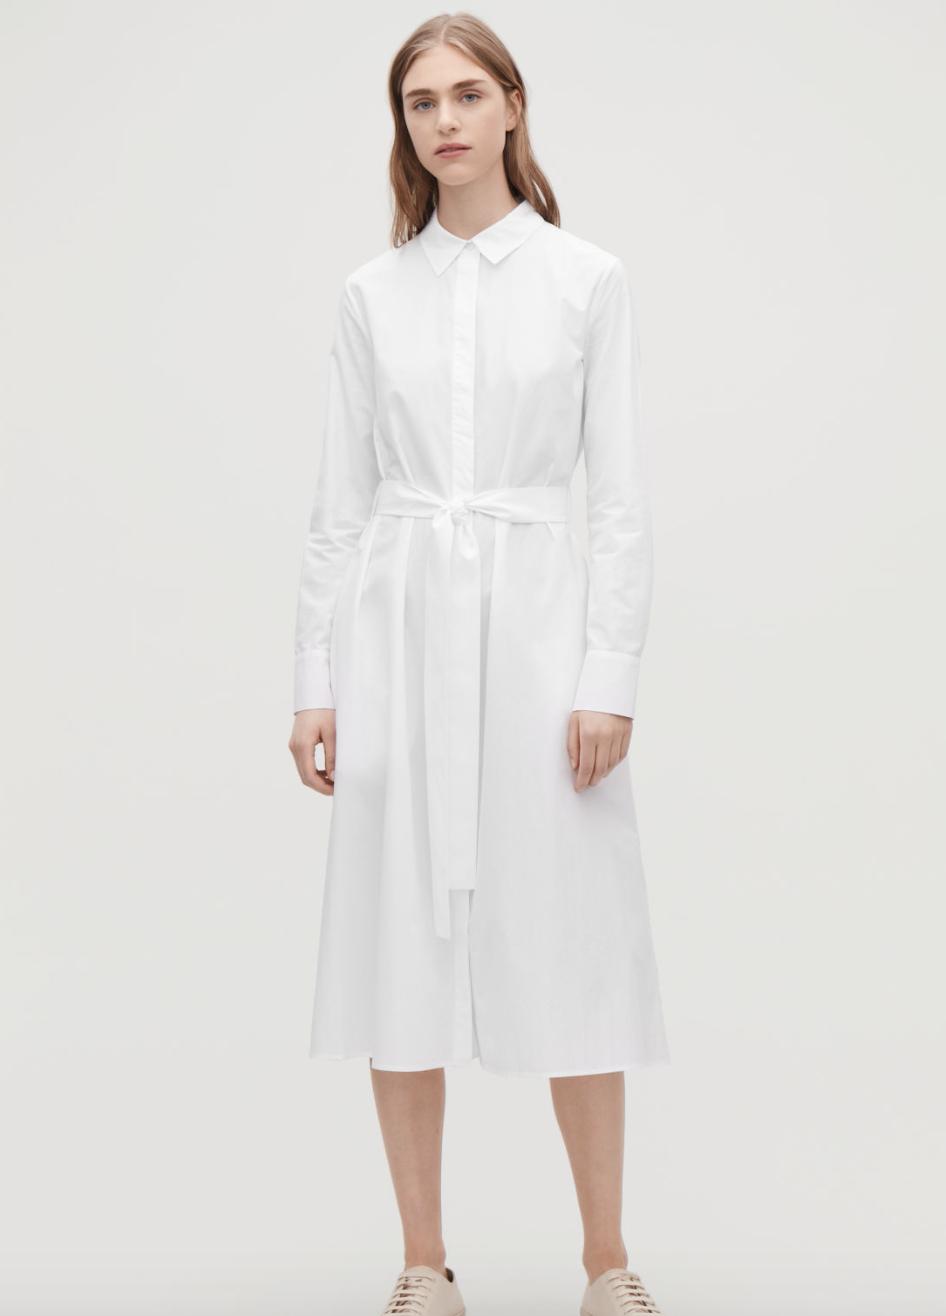 Cos, Dress, £89.00